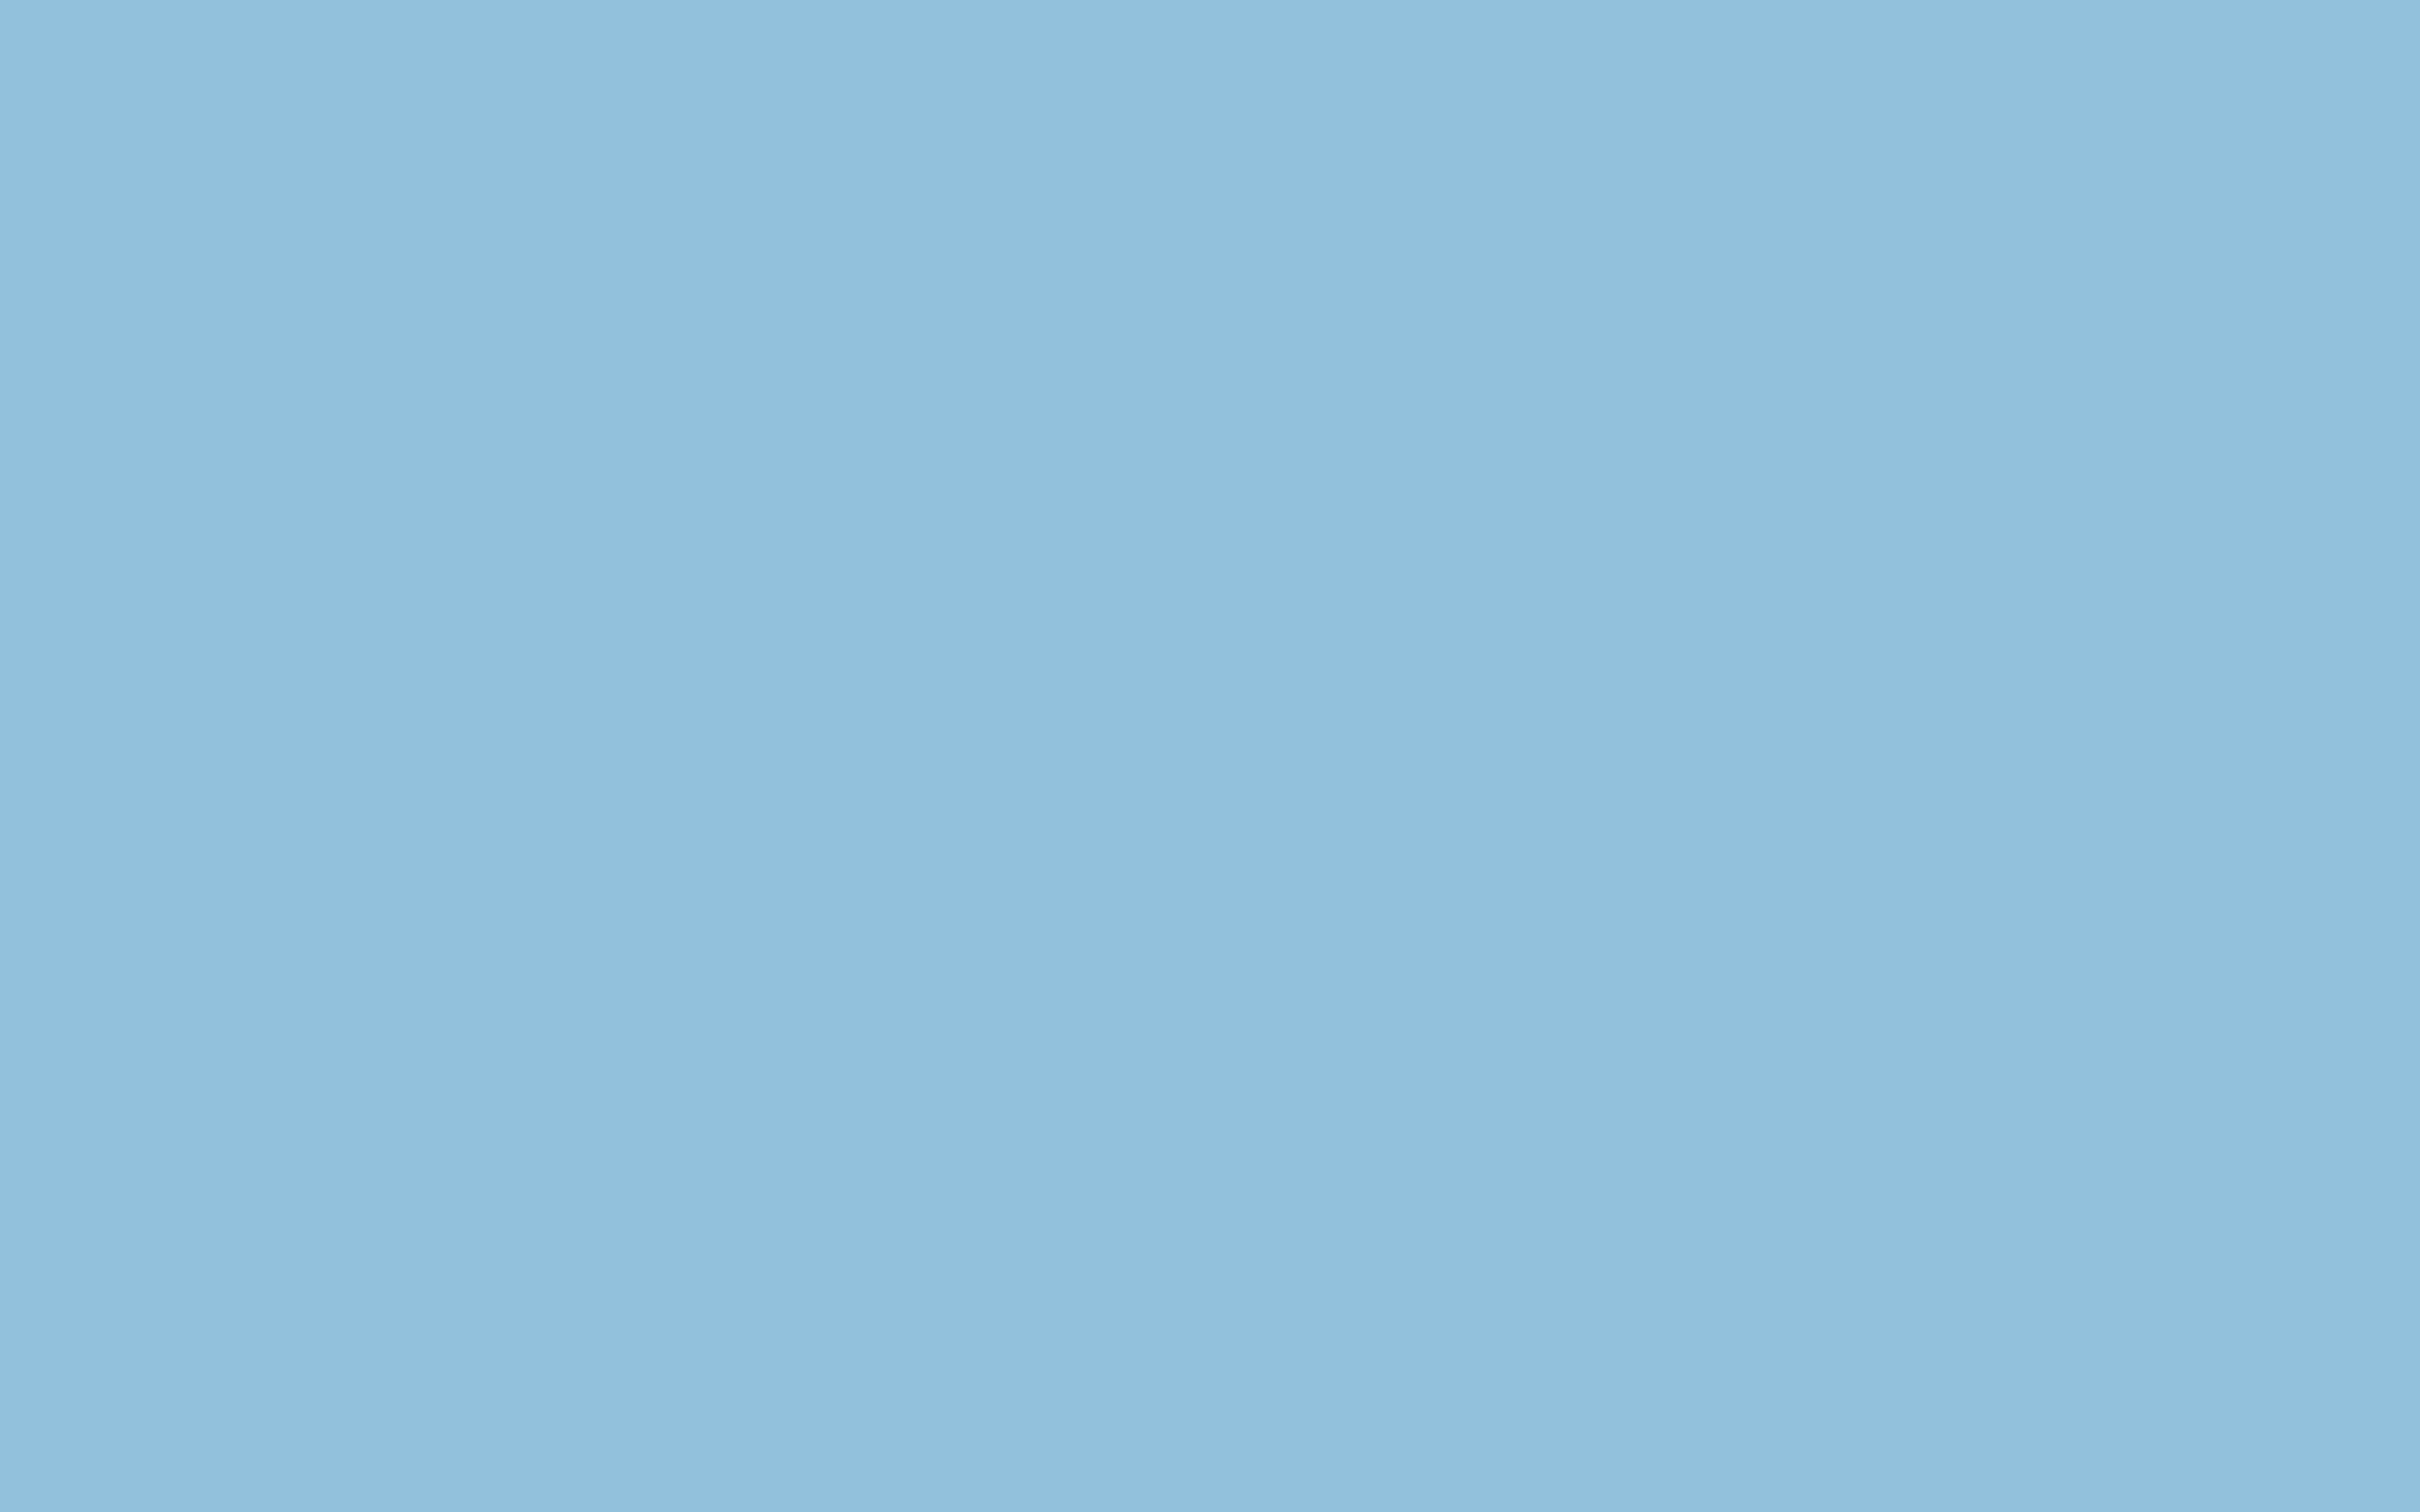 [75+] Baby Blue Wallpapers on WallpaperSafari